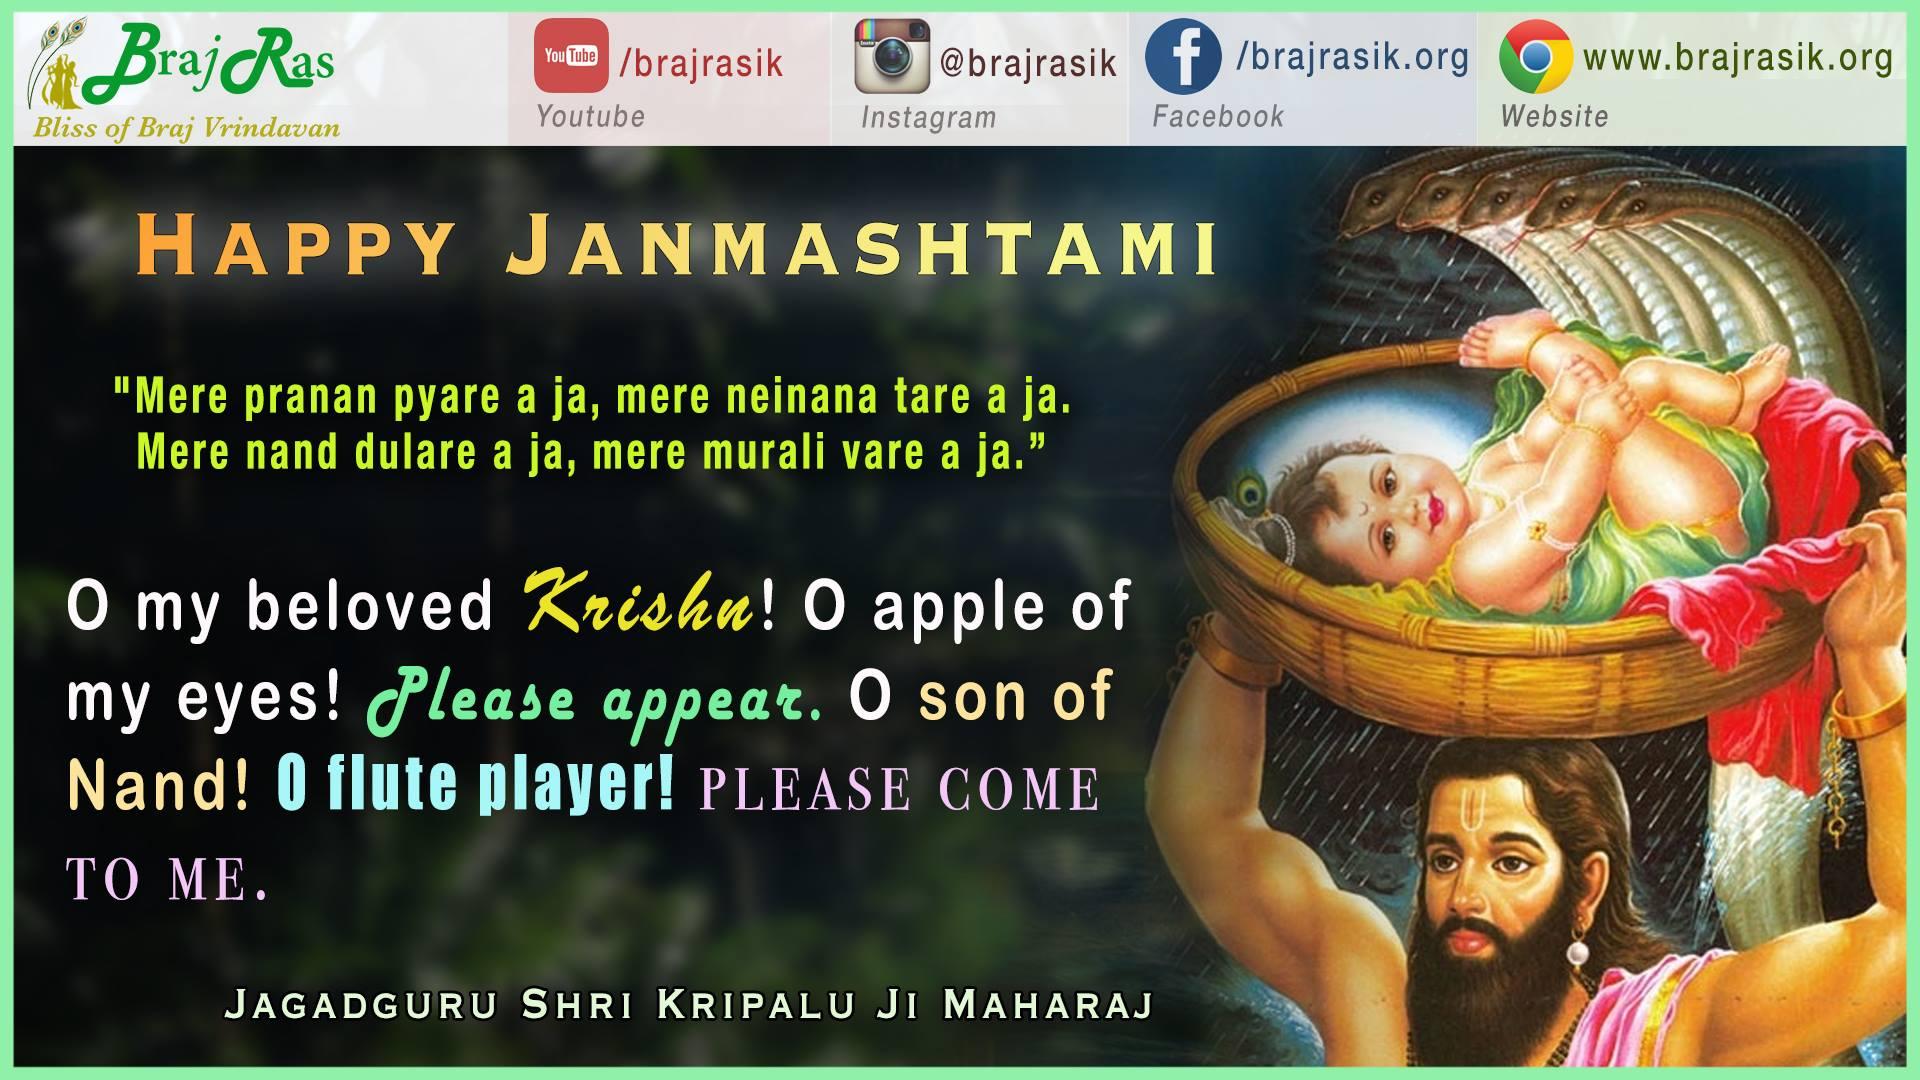 Mere pranan pyare a ja - Jagadguru Shri Kripalu Ji Maharaj